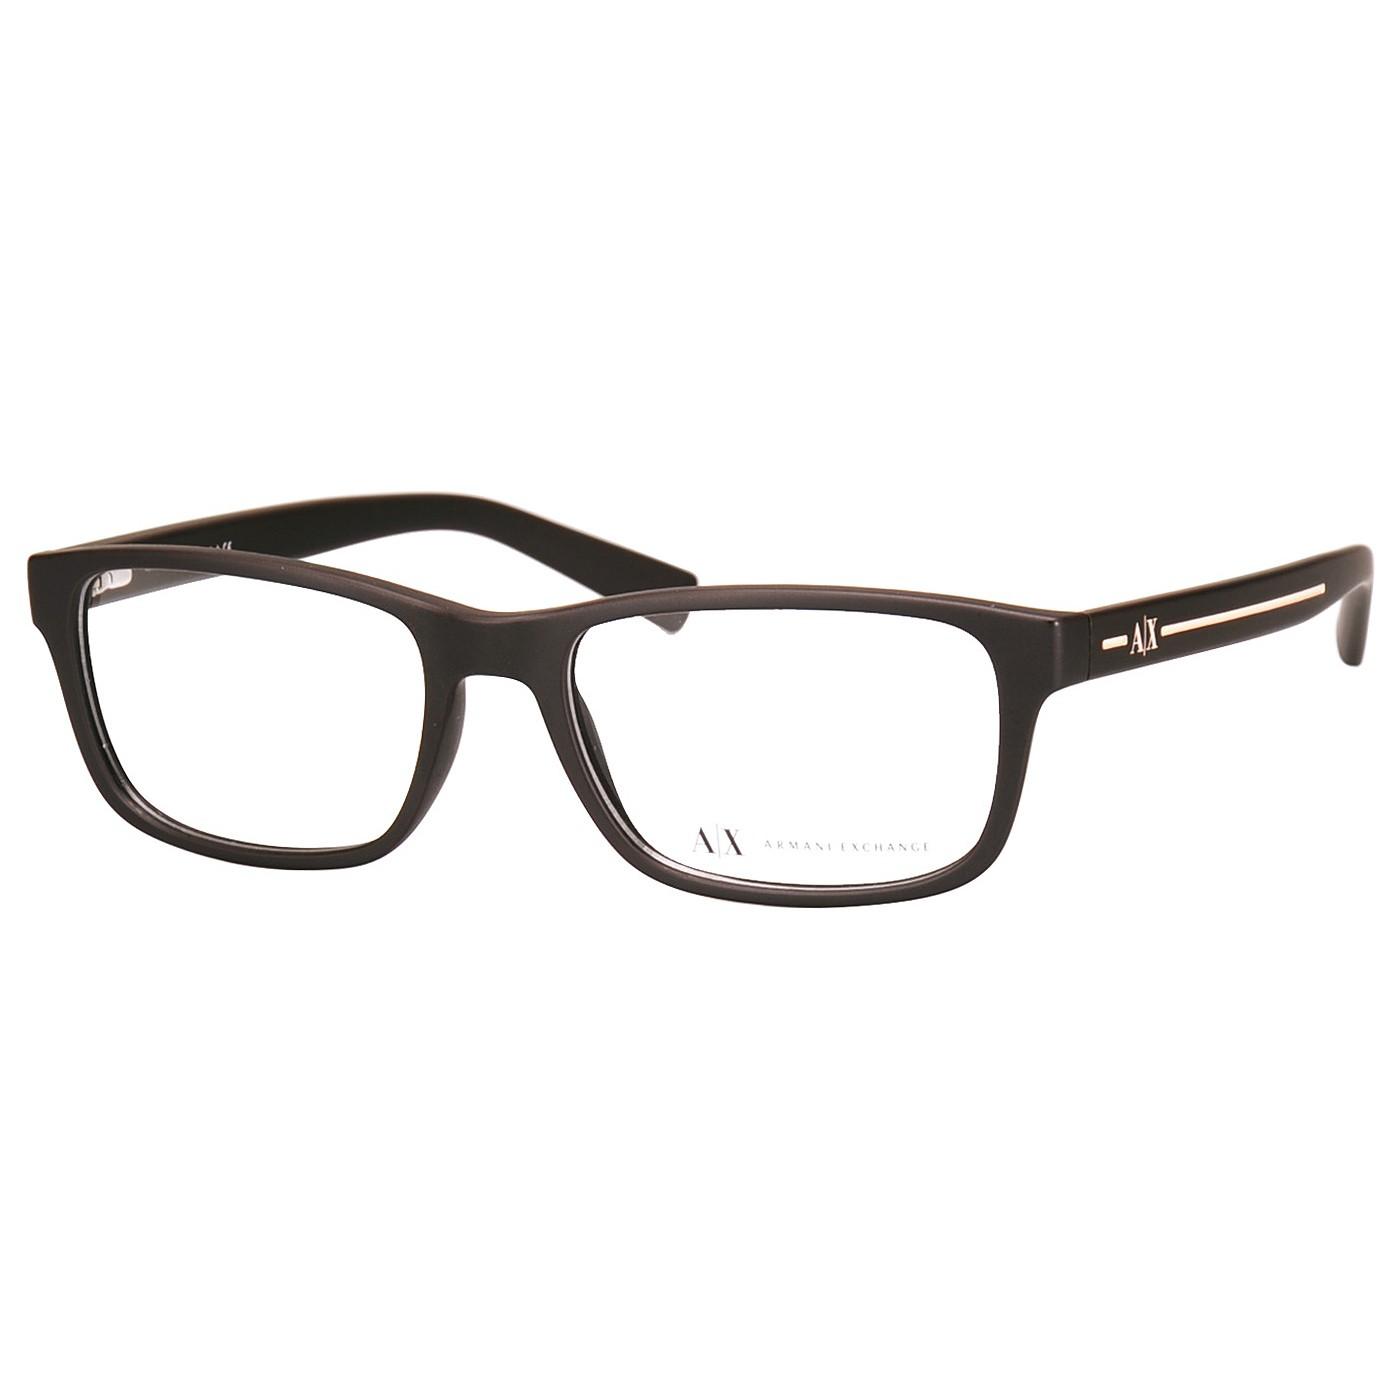 Óculos de Grau Armani Exchange Marrom Fosco AX3021 Masculino